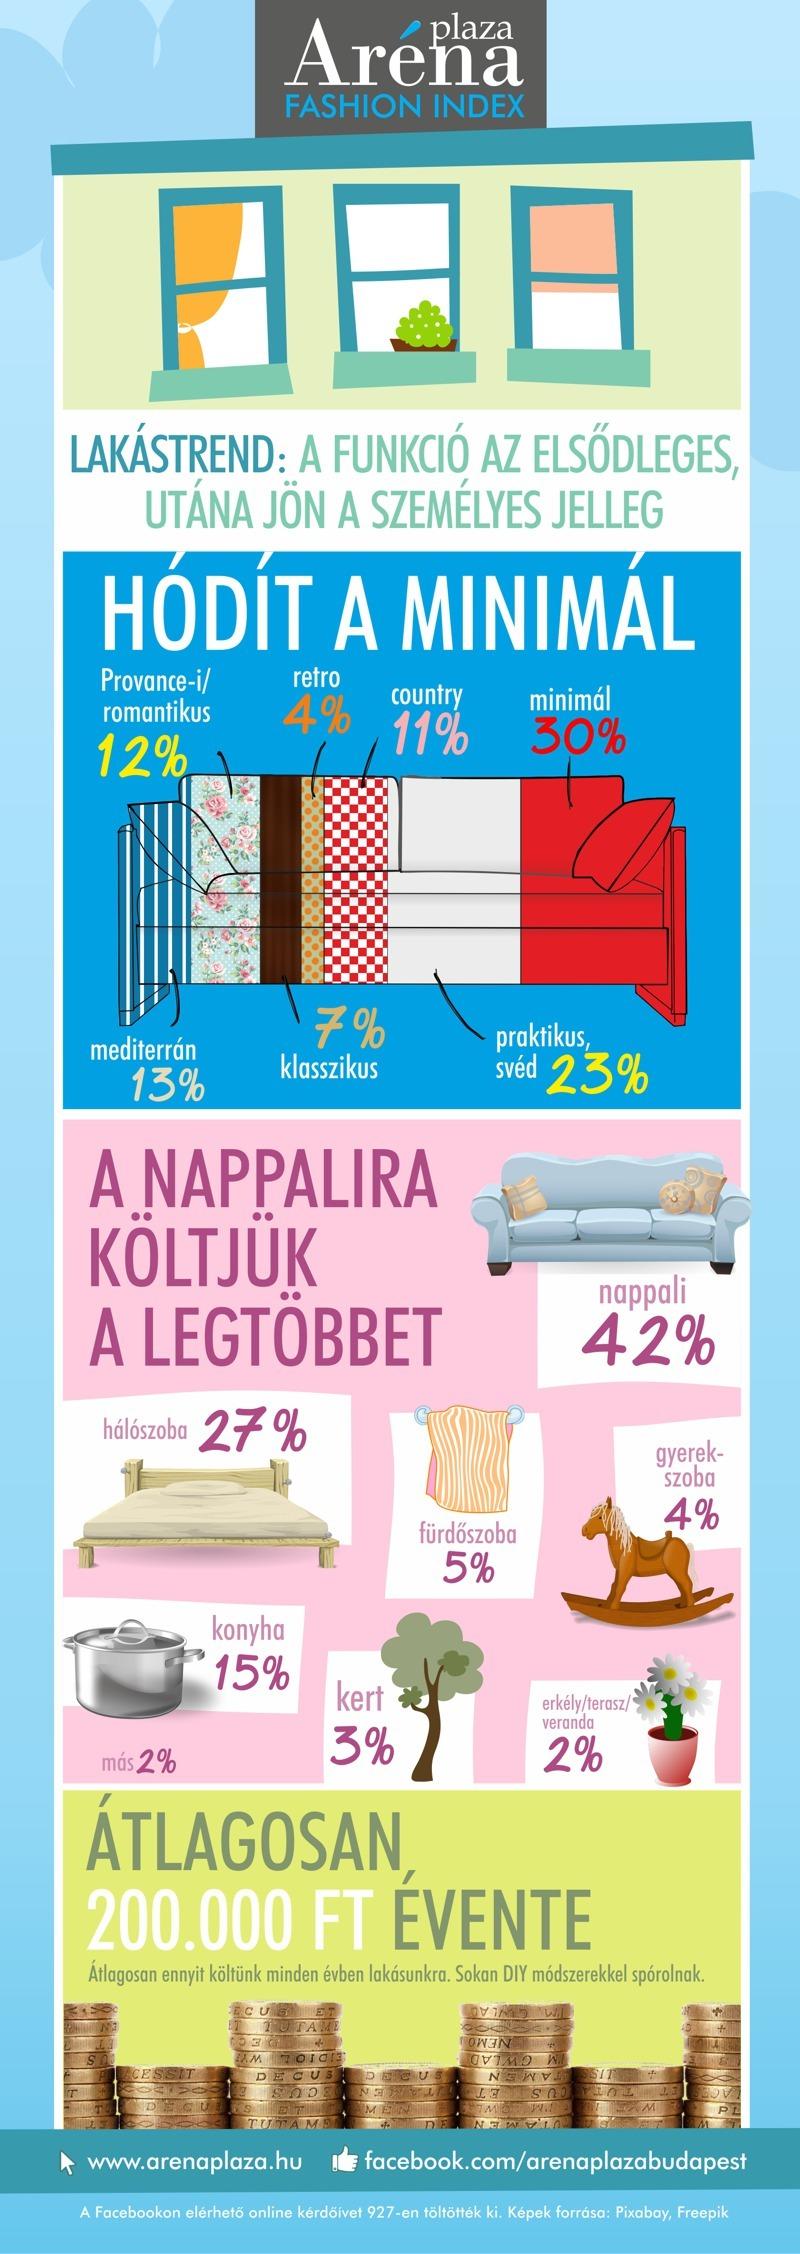 arena_fashion_index_lakastrend_infografika_20150122.jpg